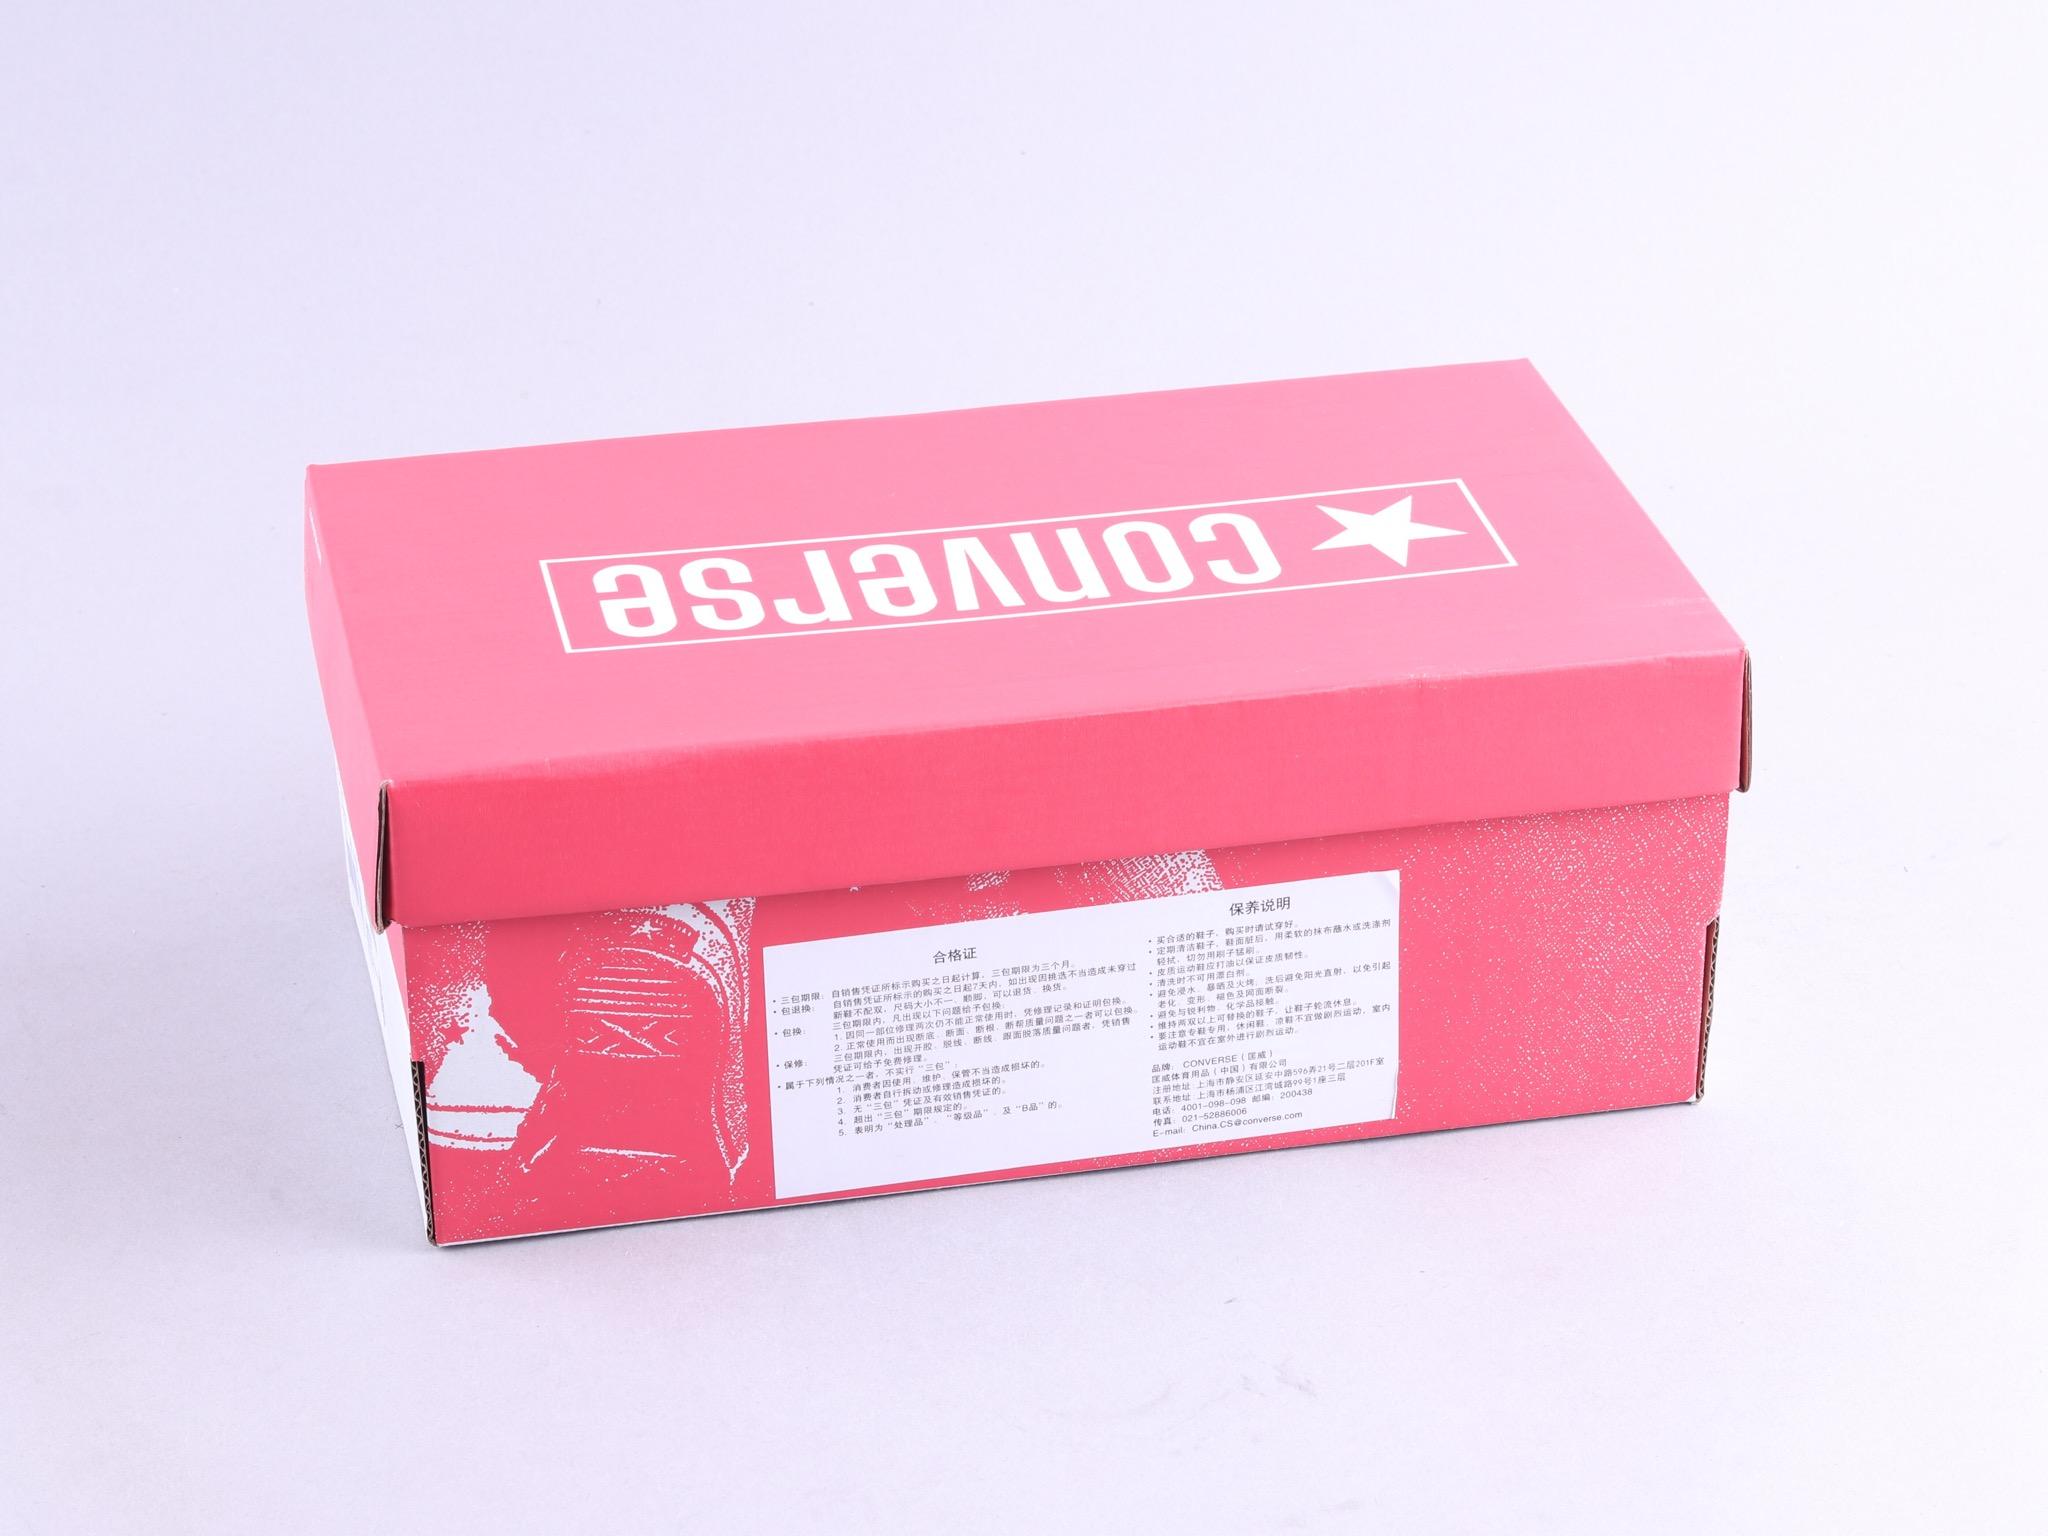 00E6BFB4-855F-4336-B886-A6A6979C4247.jpeg